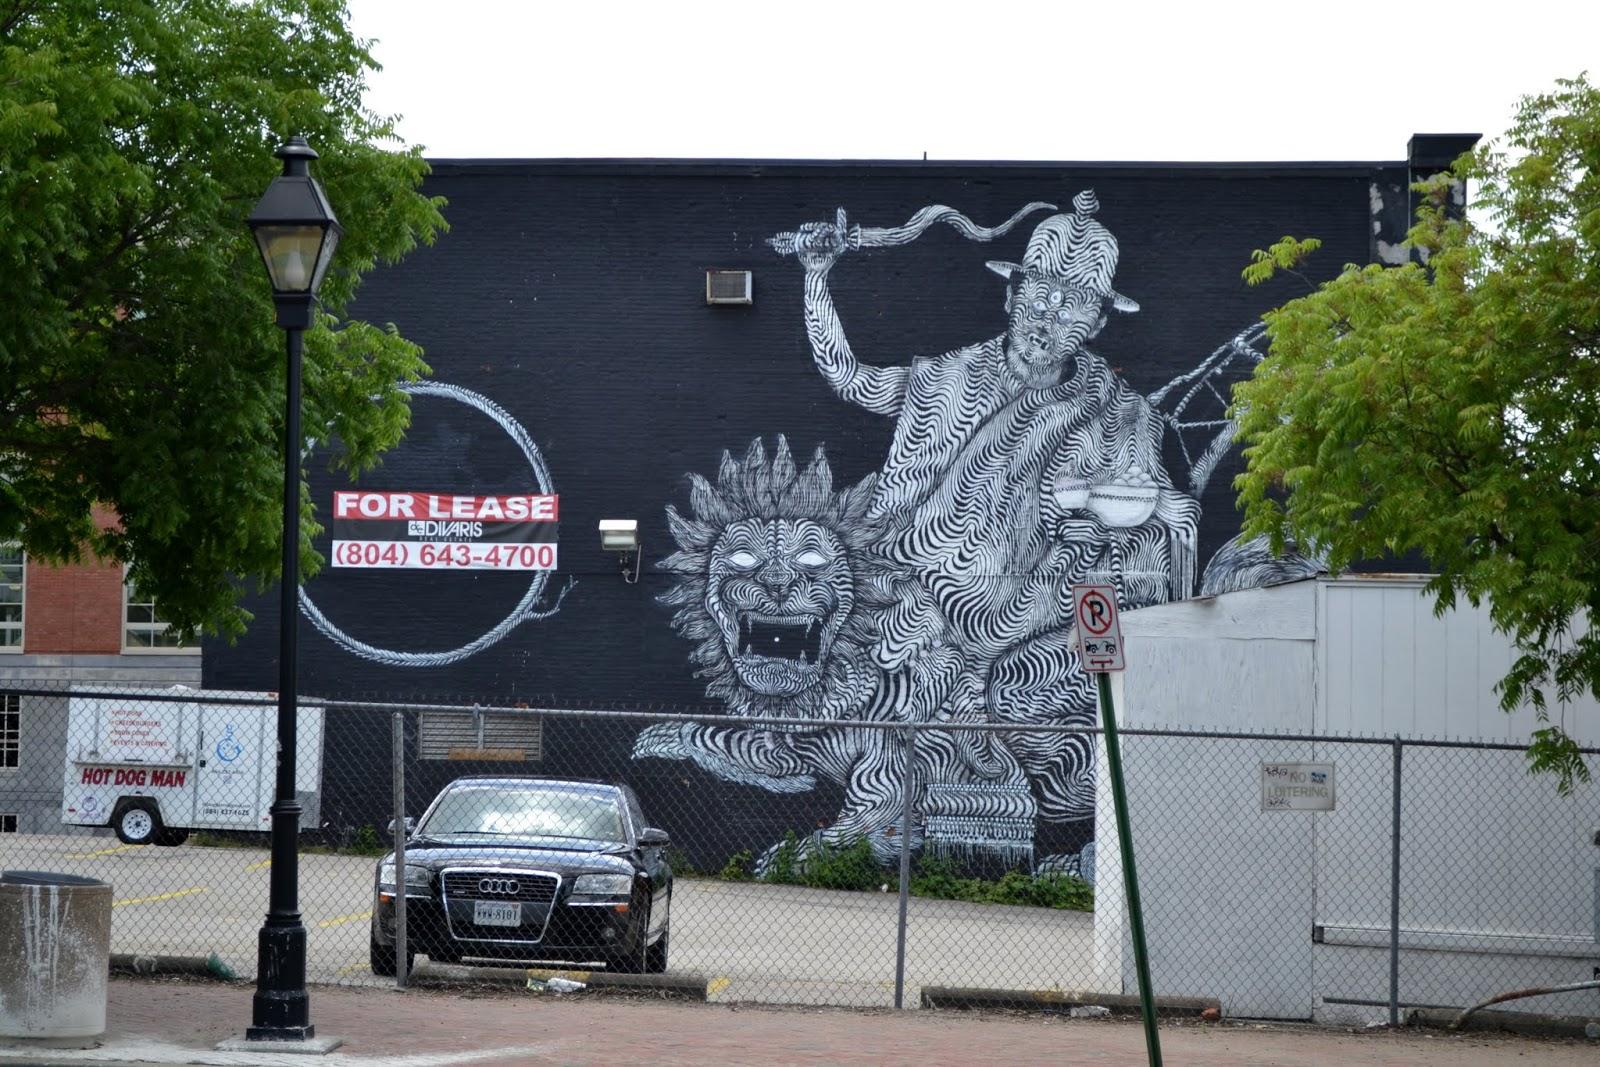 Муралы. Ричмонд, Вирджиния (Murals. Richmond, VA)